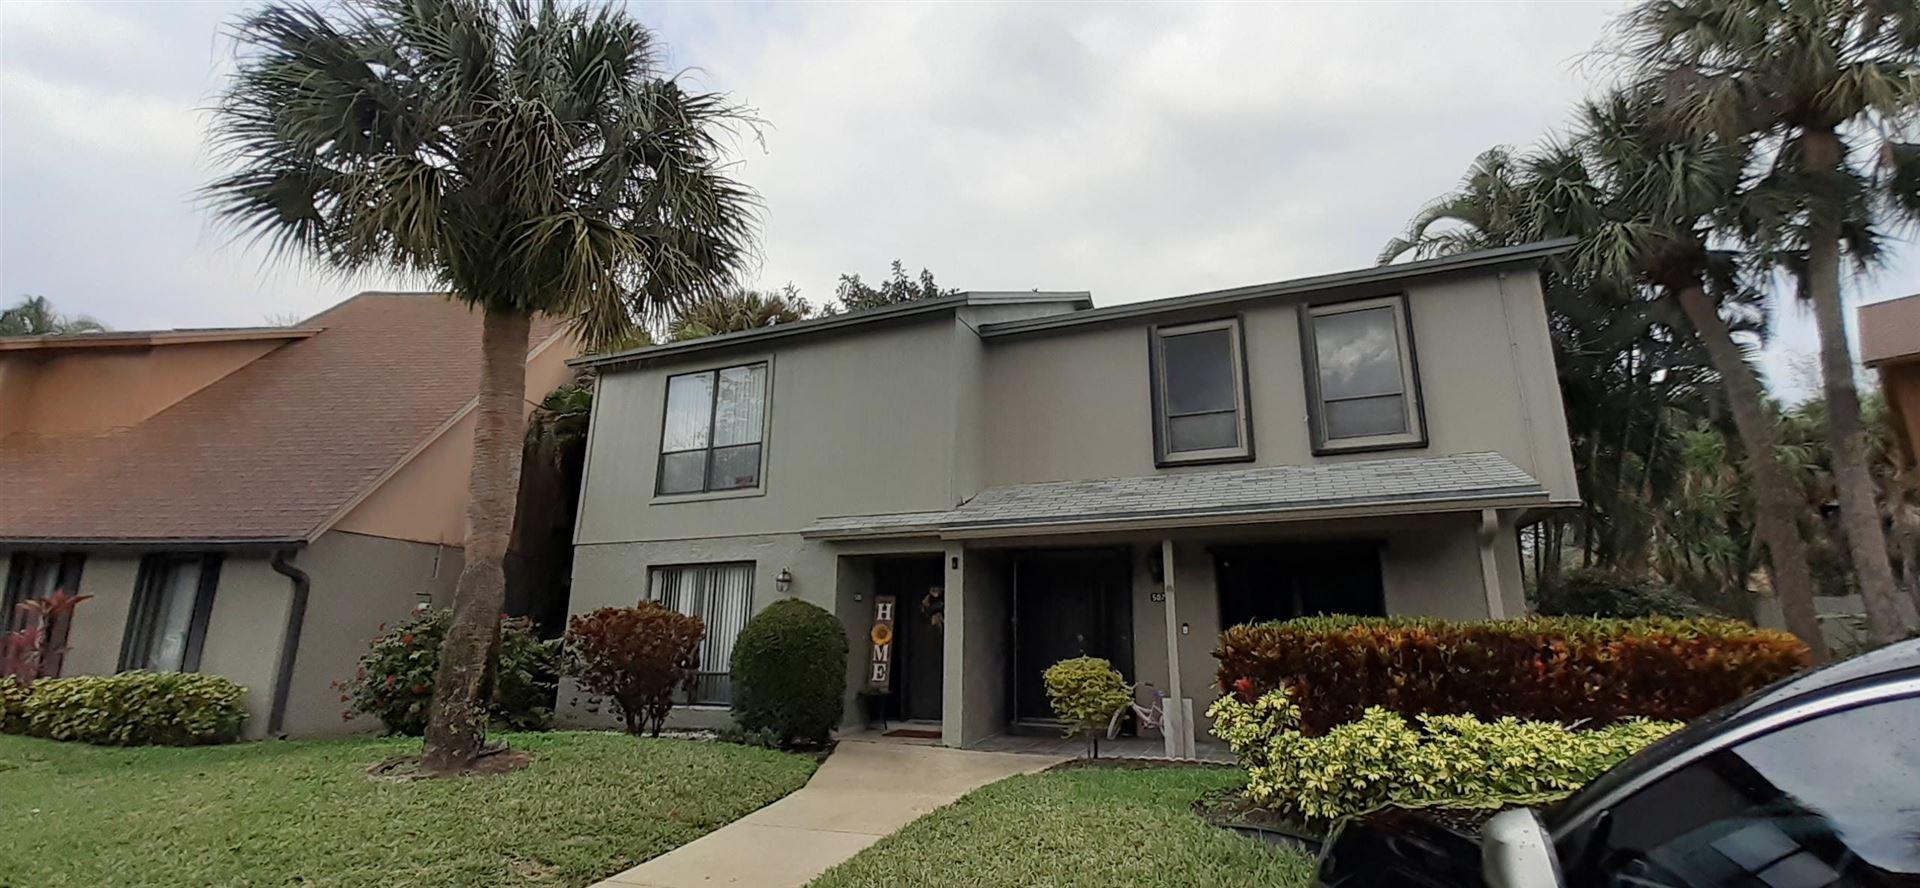 508 Sandtree Drive, Palm Beach Gardens, FL 33403 - MLS#: RX-10694170